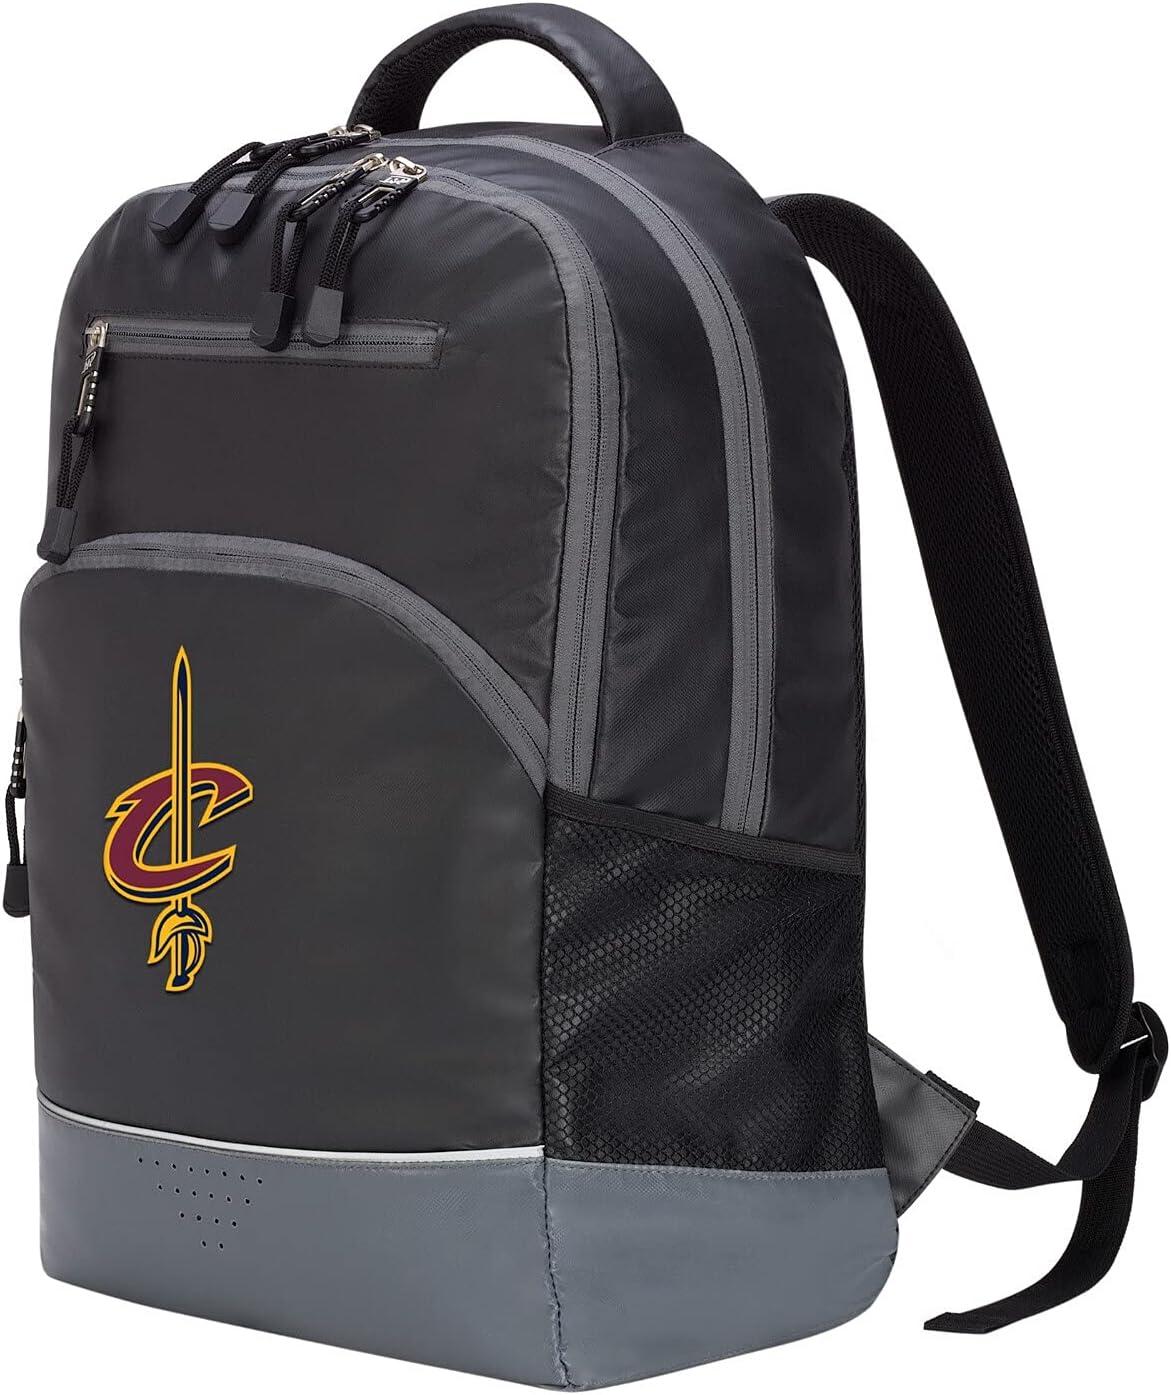 Northwest Wholesale Luxury goods Cleveland Cavaliers Backpack Alliance